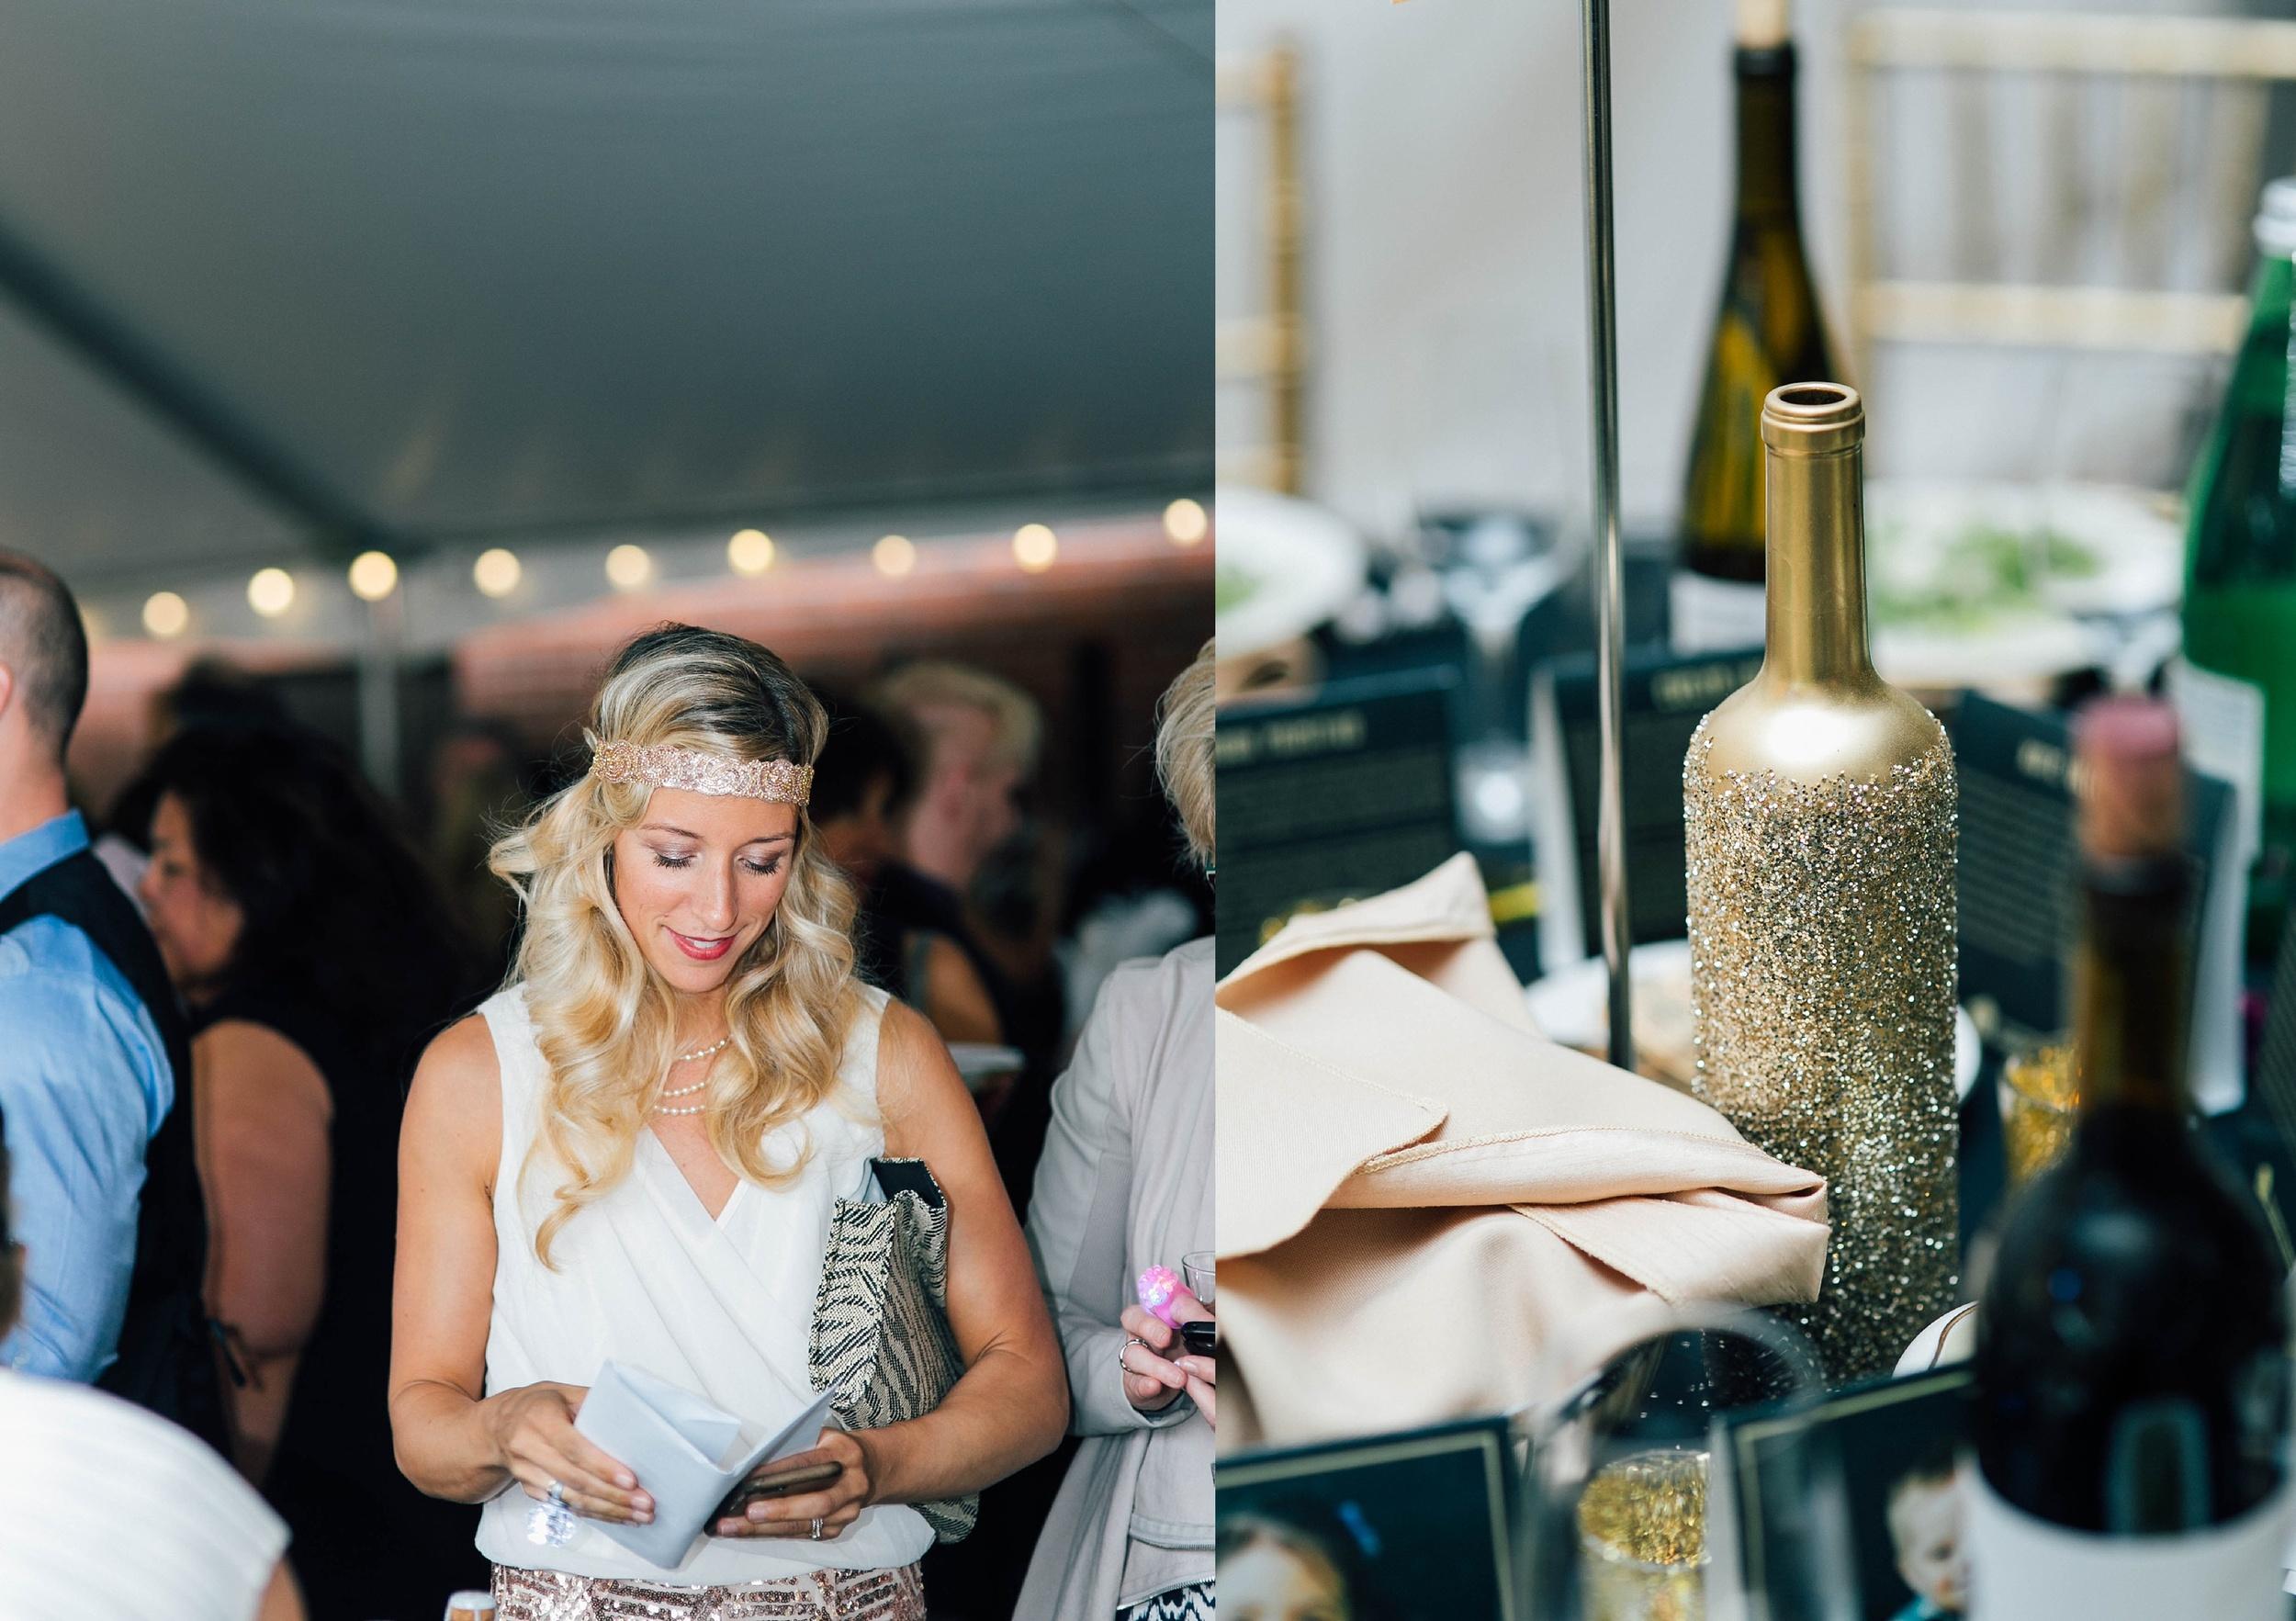 ashley_vos_seattle_wedding_photographer_0026.jpg